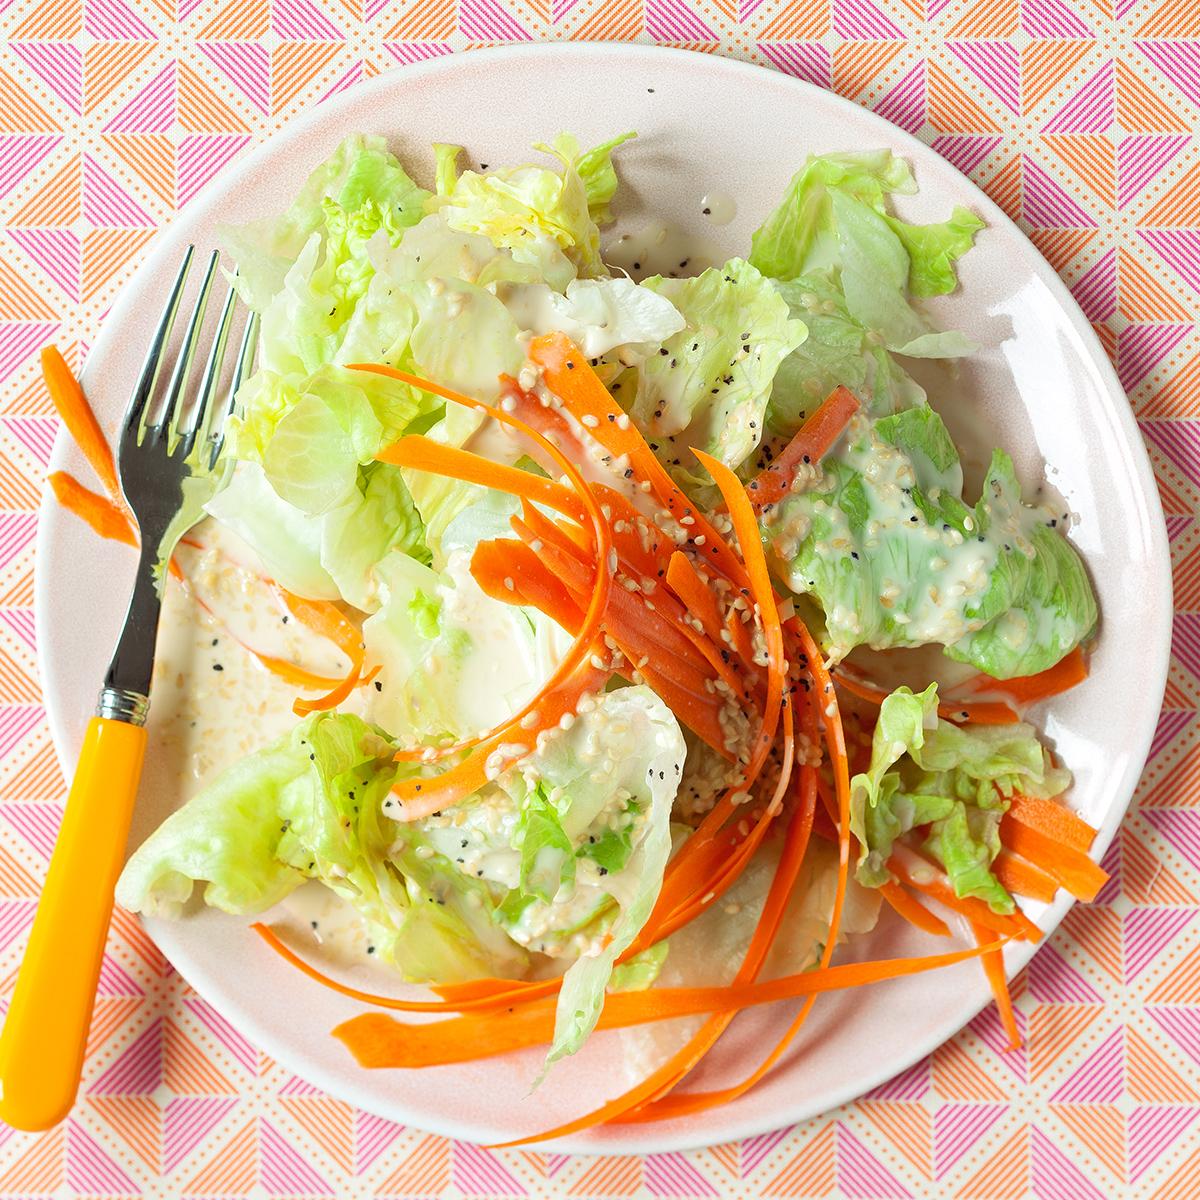 gingered iceberg salad